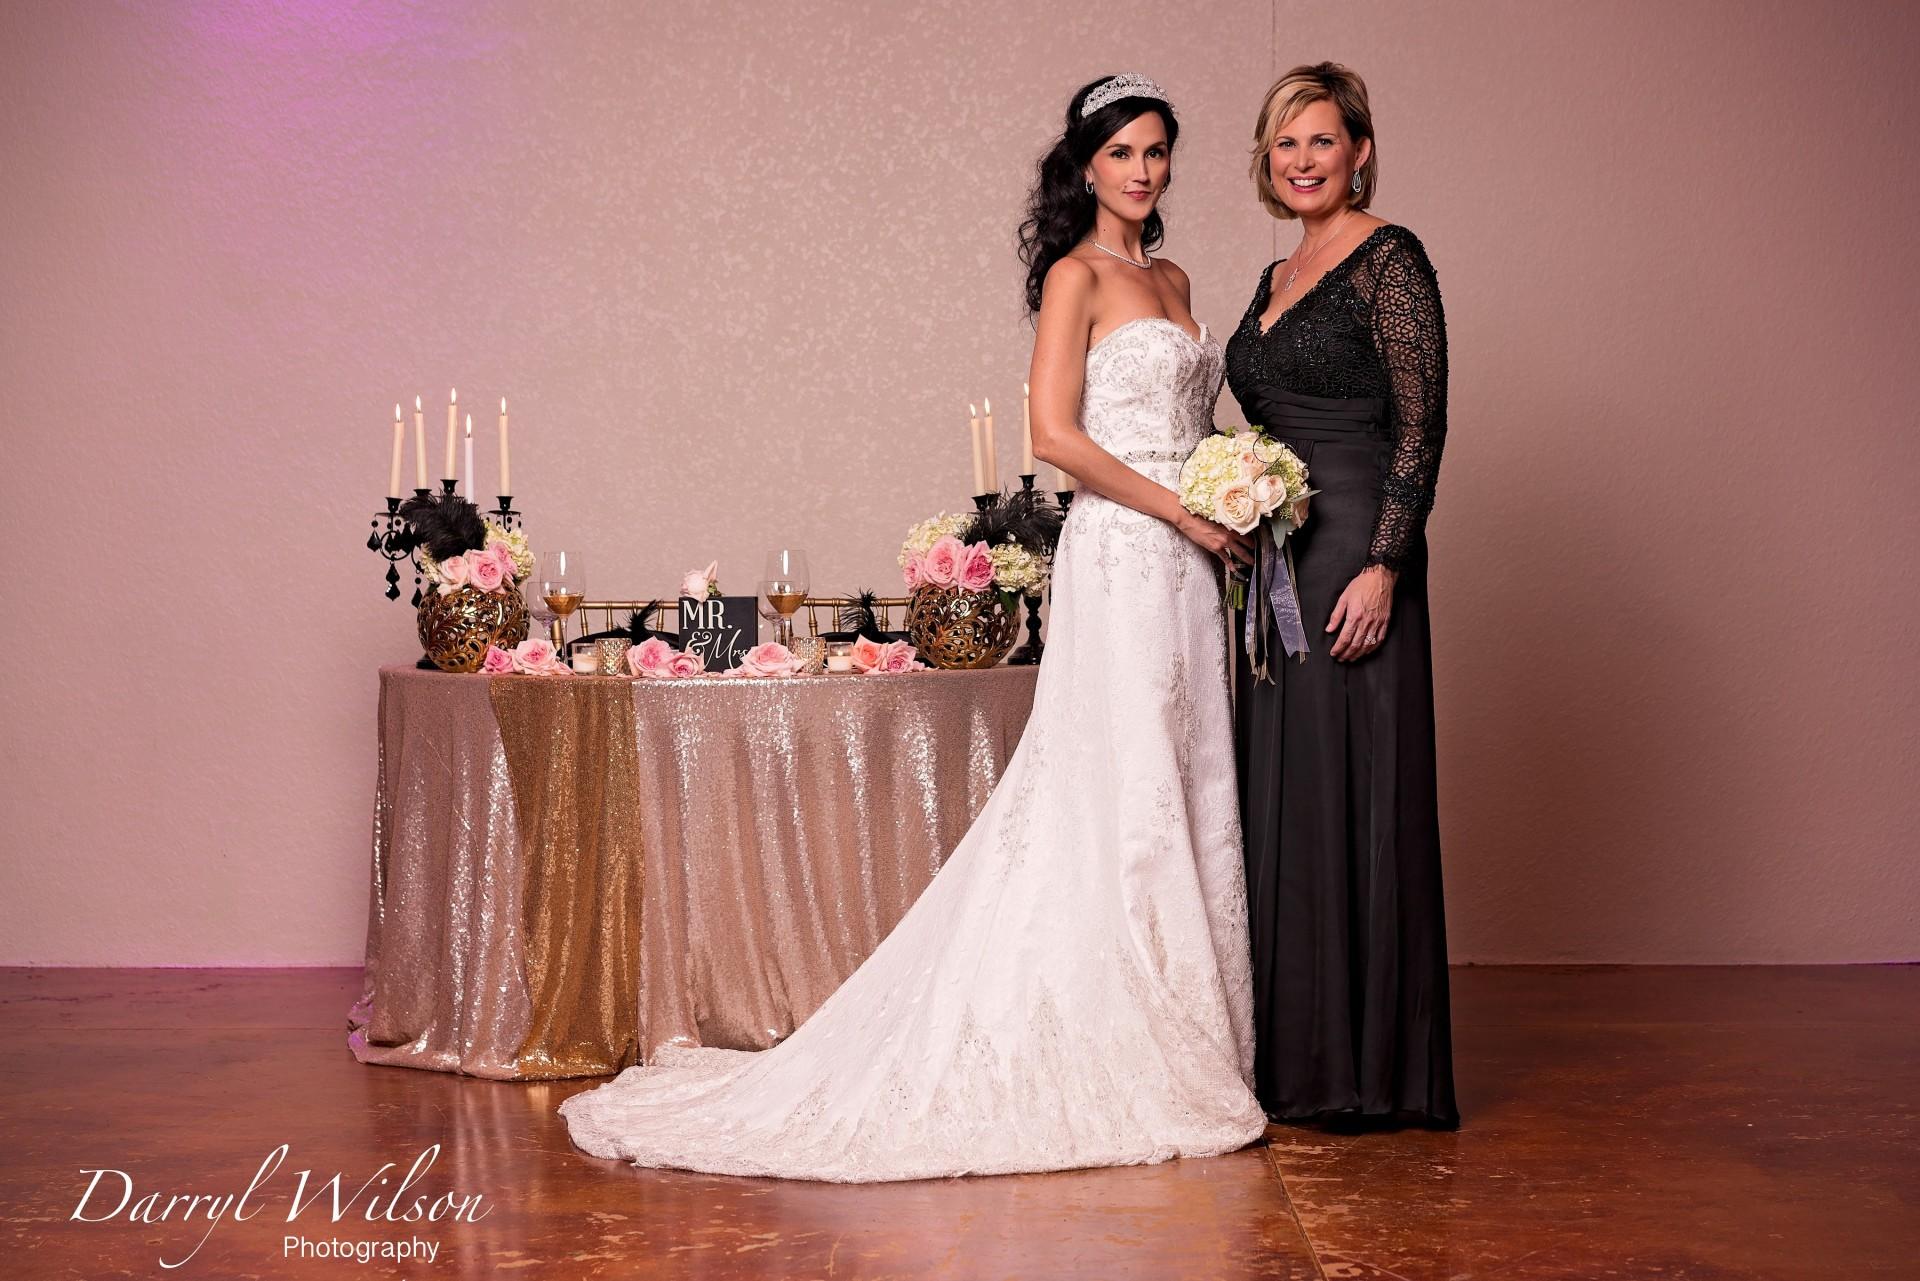 Custom Wedding Dresses, Bridal Gowns, Bridesmaids Dresses & More!